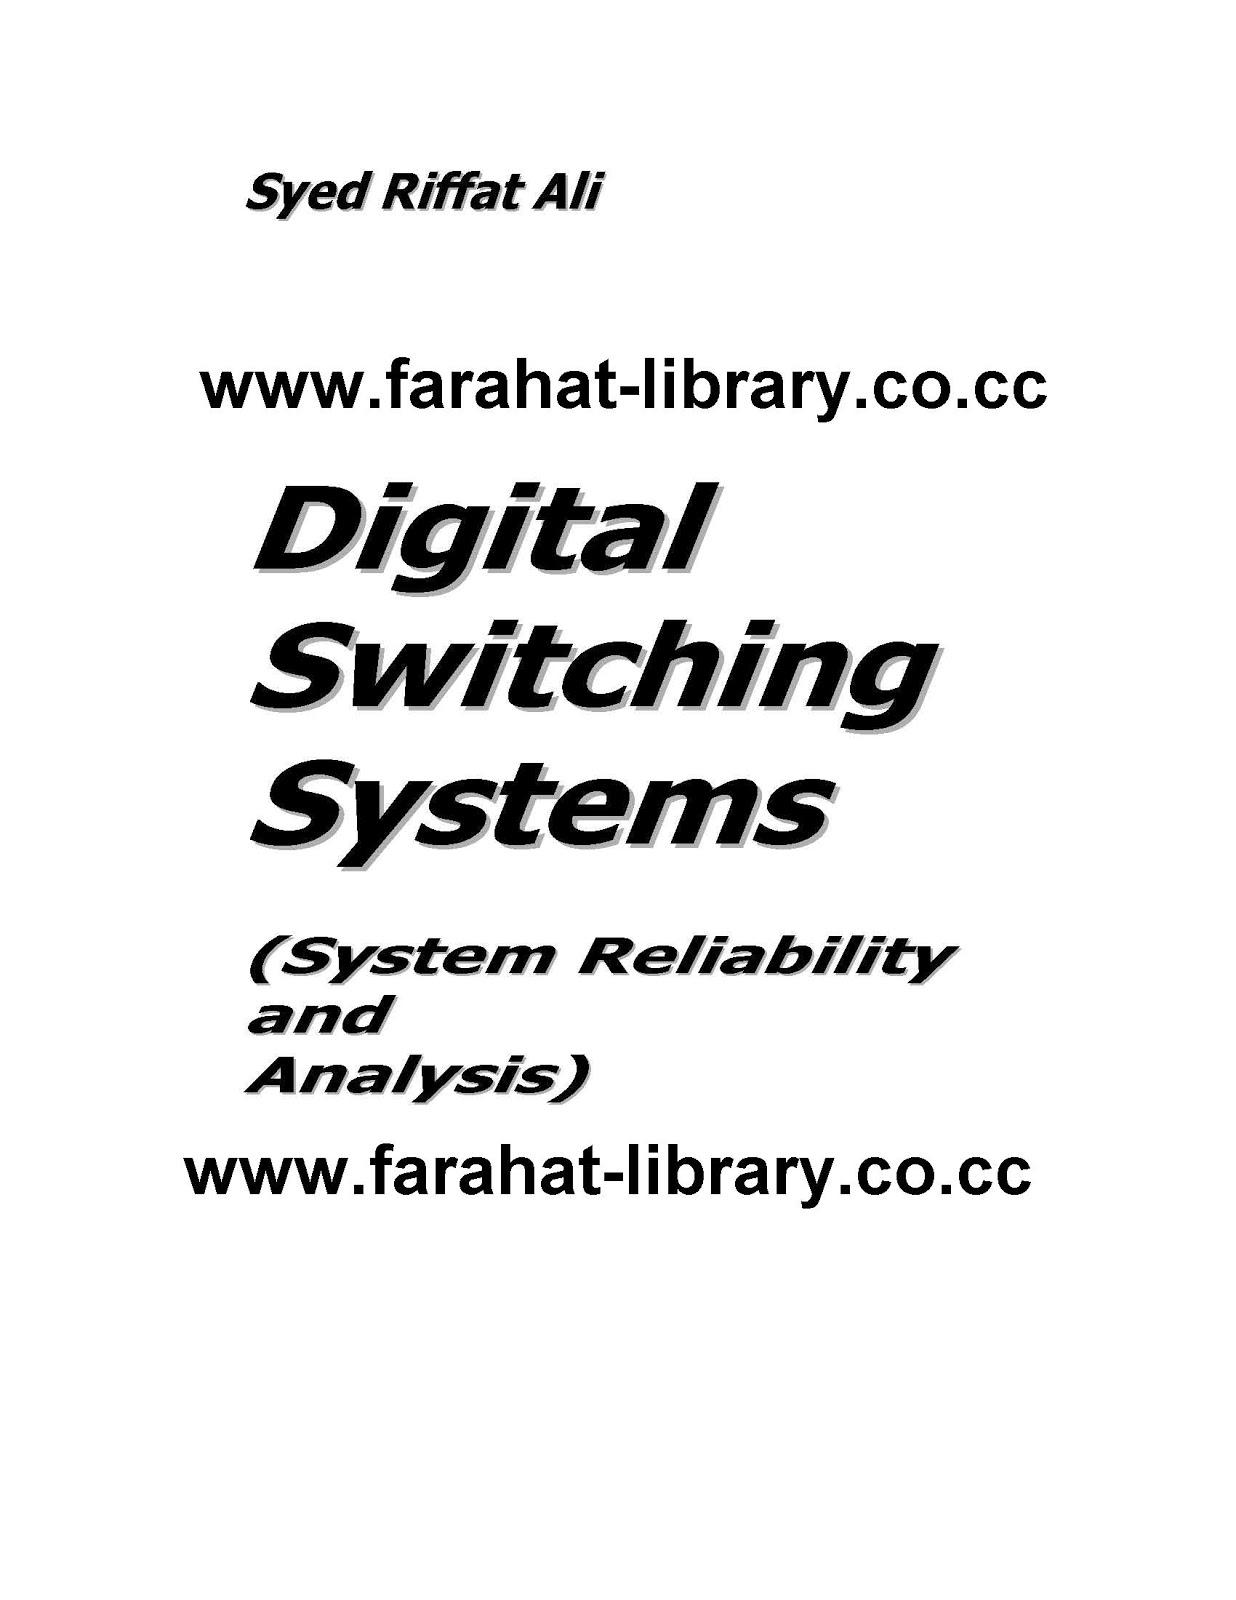 u062a u062d u0645 u064a u0644  u0643 u062a u0627 u0628 digital switching systems  u0627 u0648  u0627 u0644 u062a u0628 u062f u064a u0644  u0627 u0644 u0631 u0642 u0645 u064a  u0639 u0644 u064a